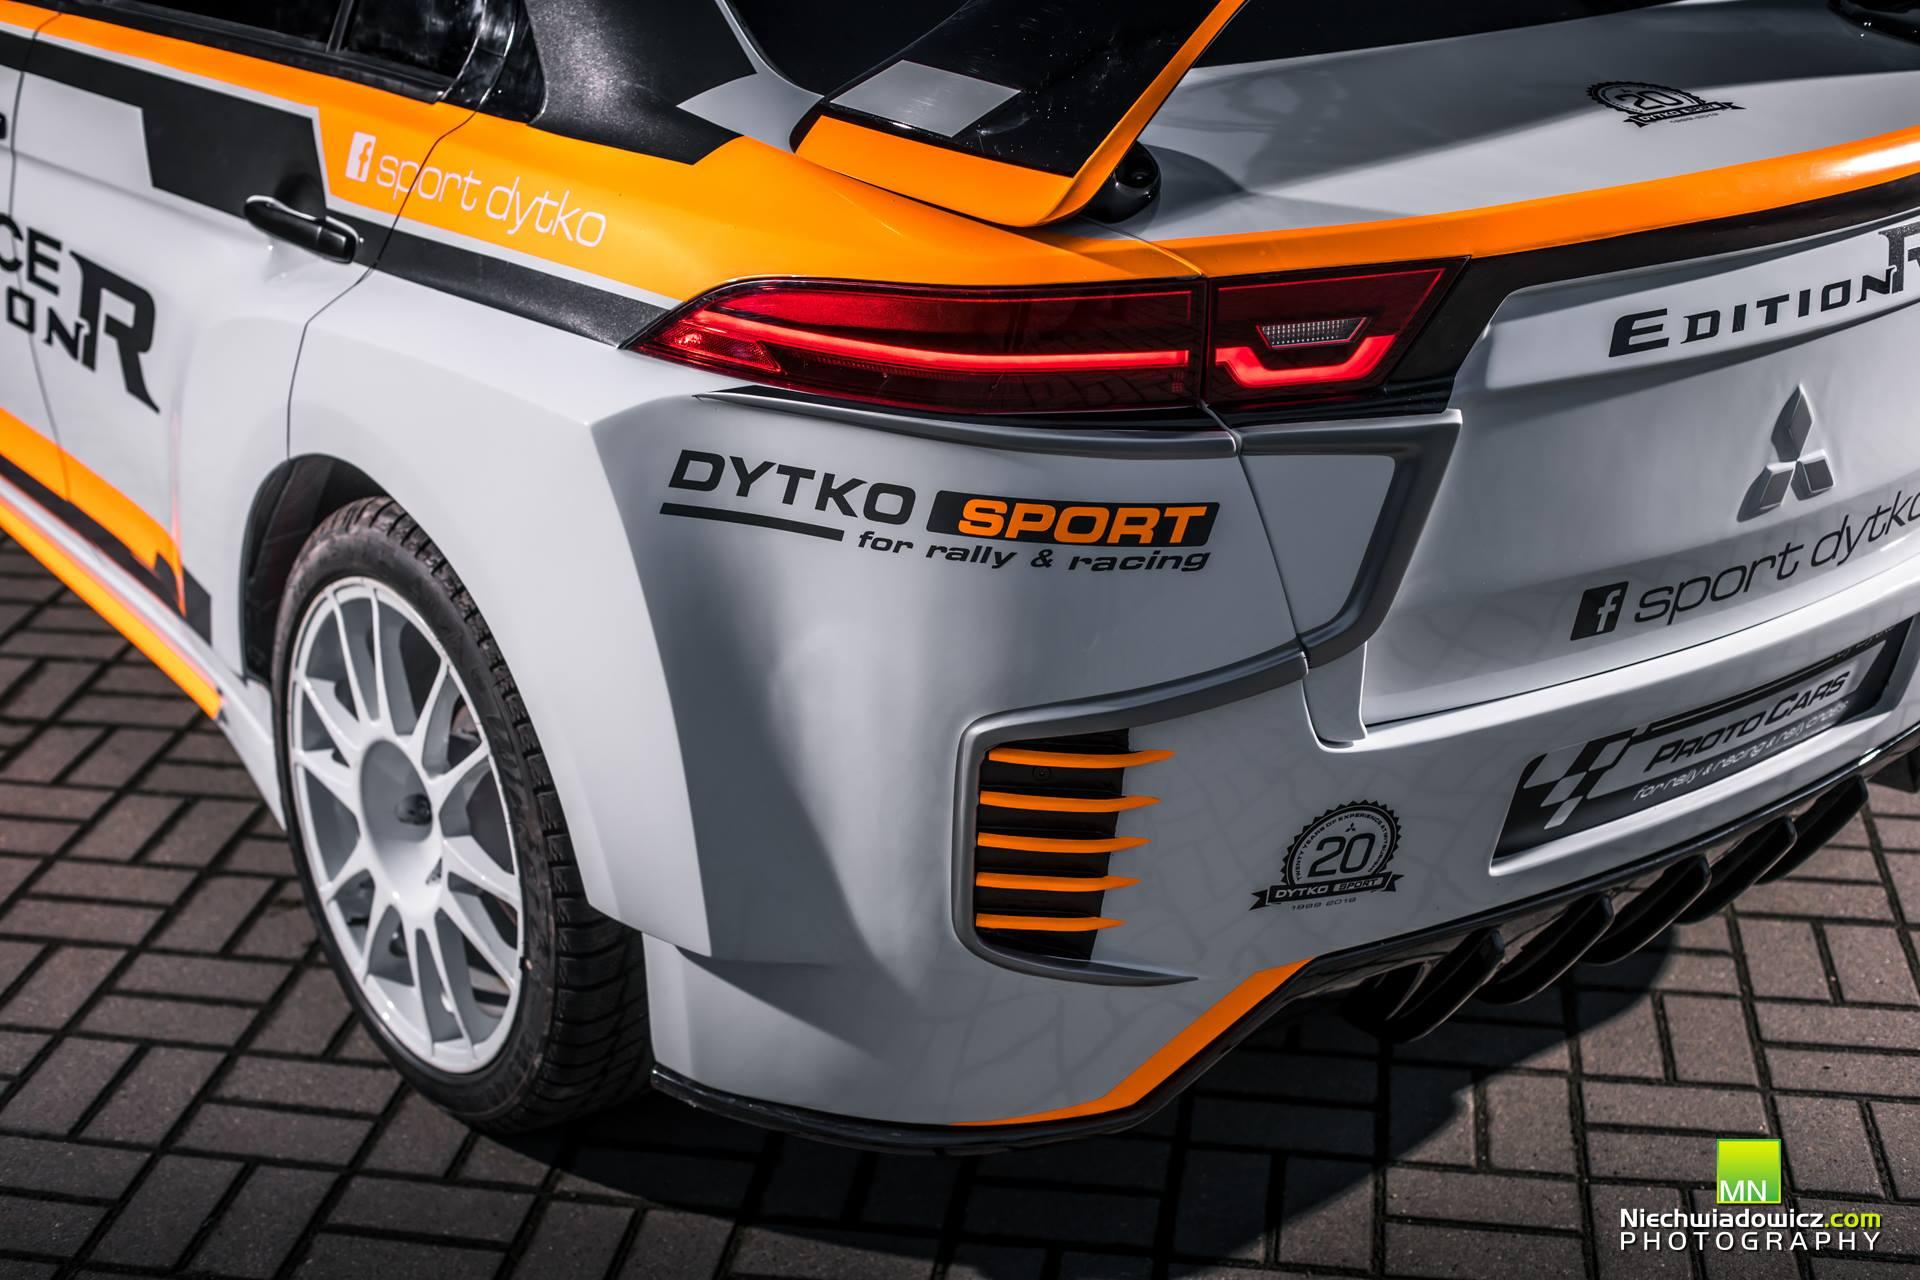 Mitsubishi_Lancer_Edition_R_by_Dytko_Sport_0000